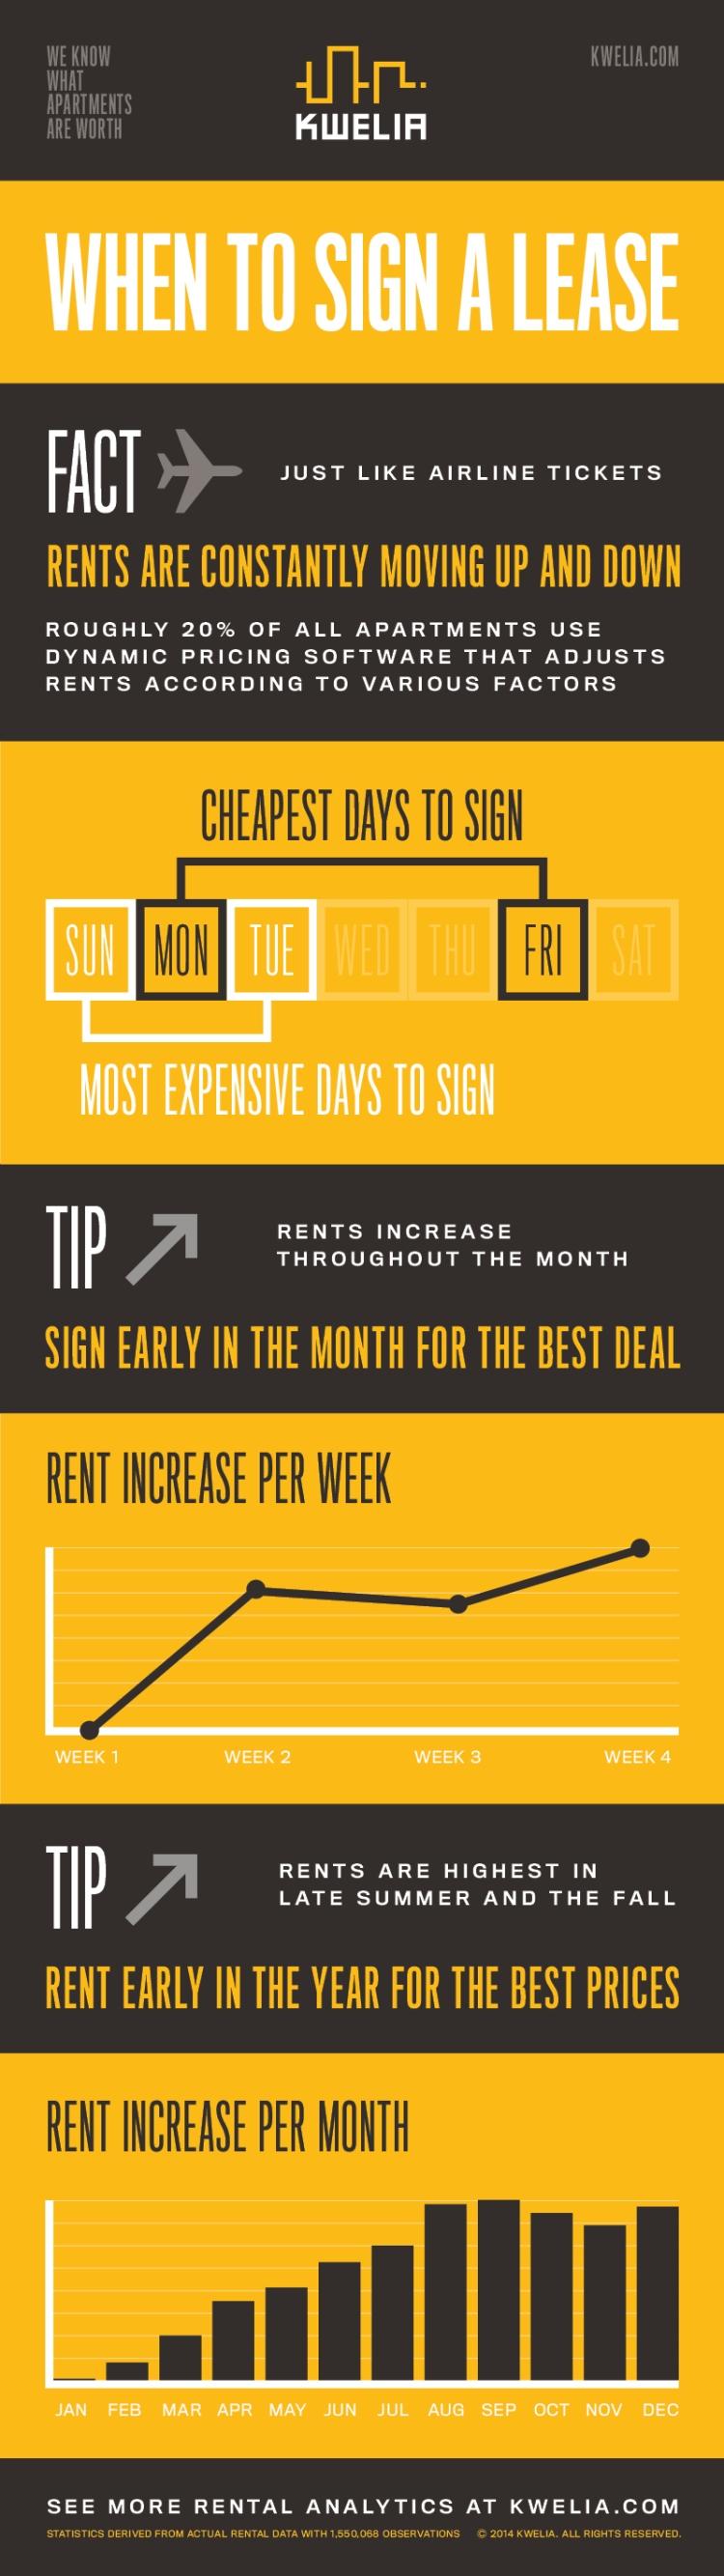 kwelia_lease_infographic_04